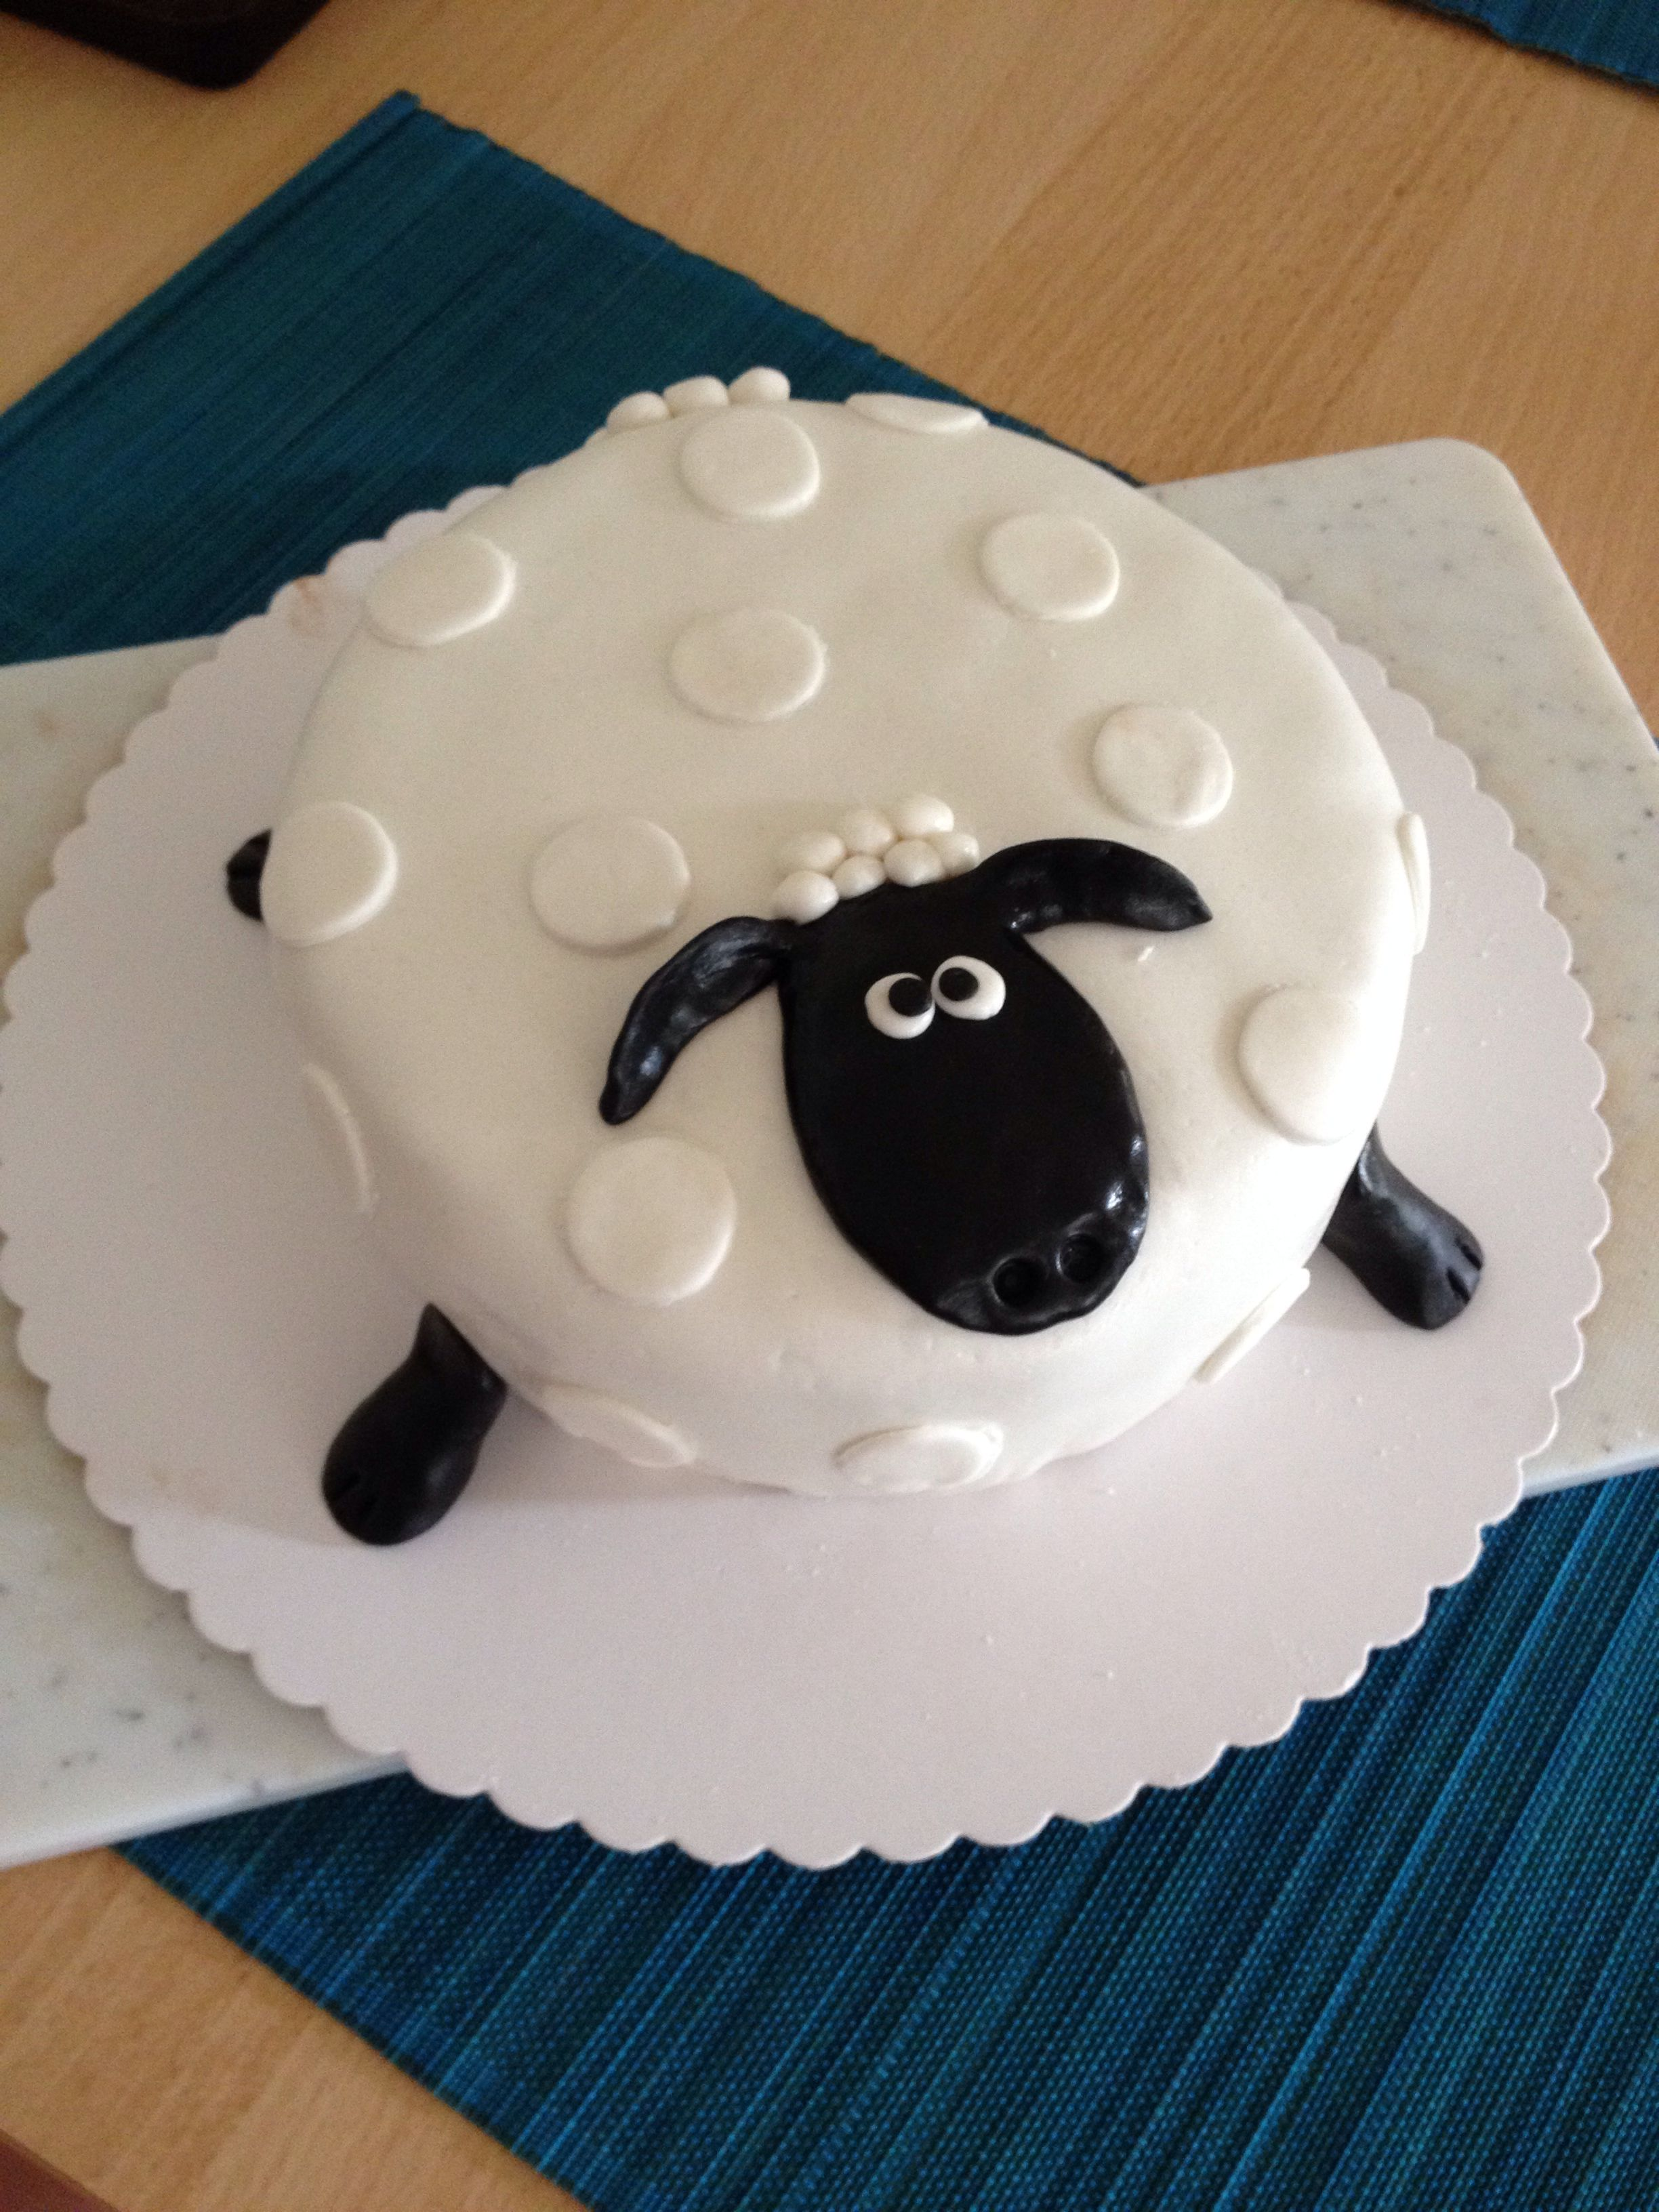 Mein erster Fondant Kuchen Shaun das Schaf